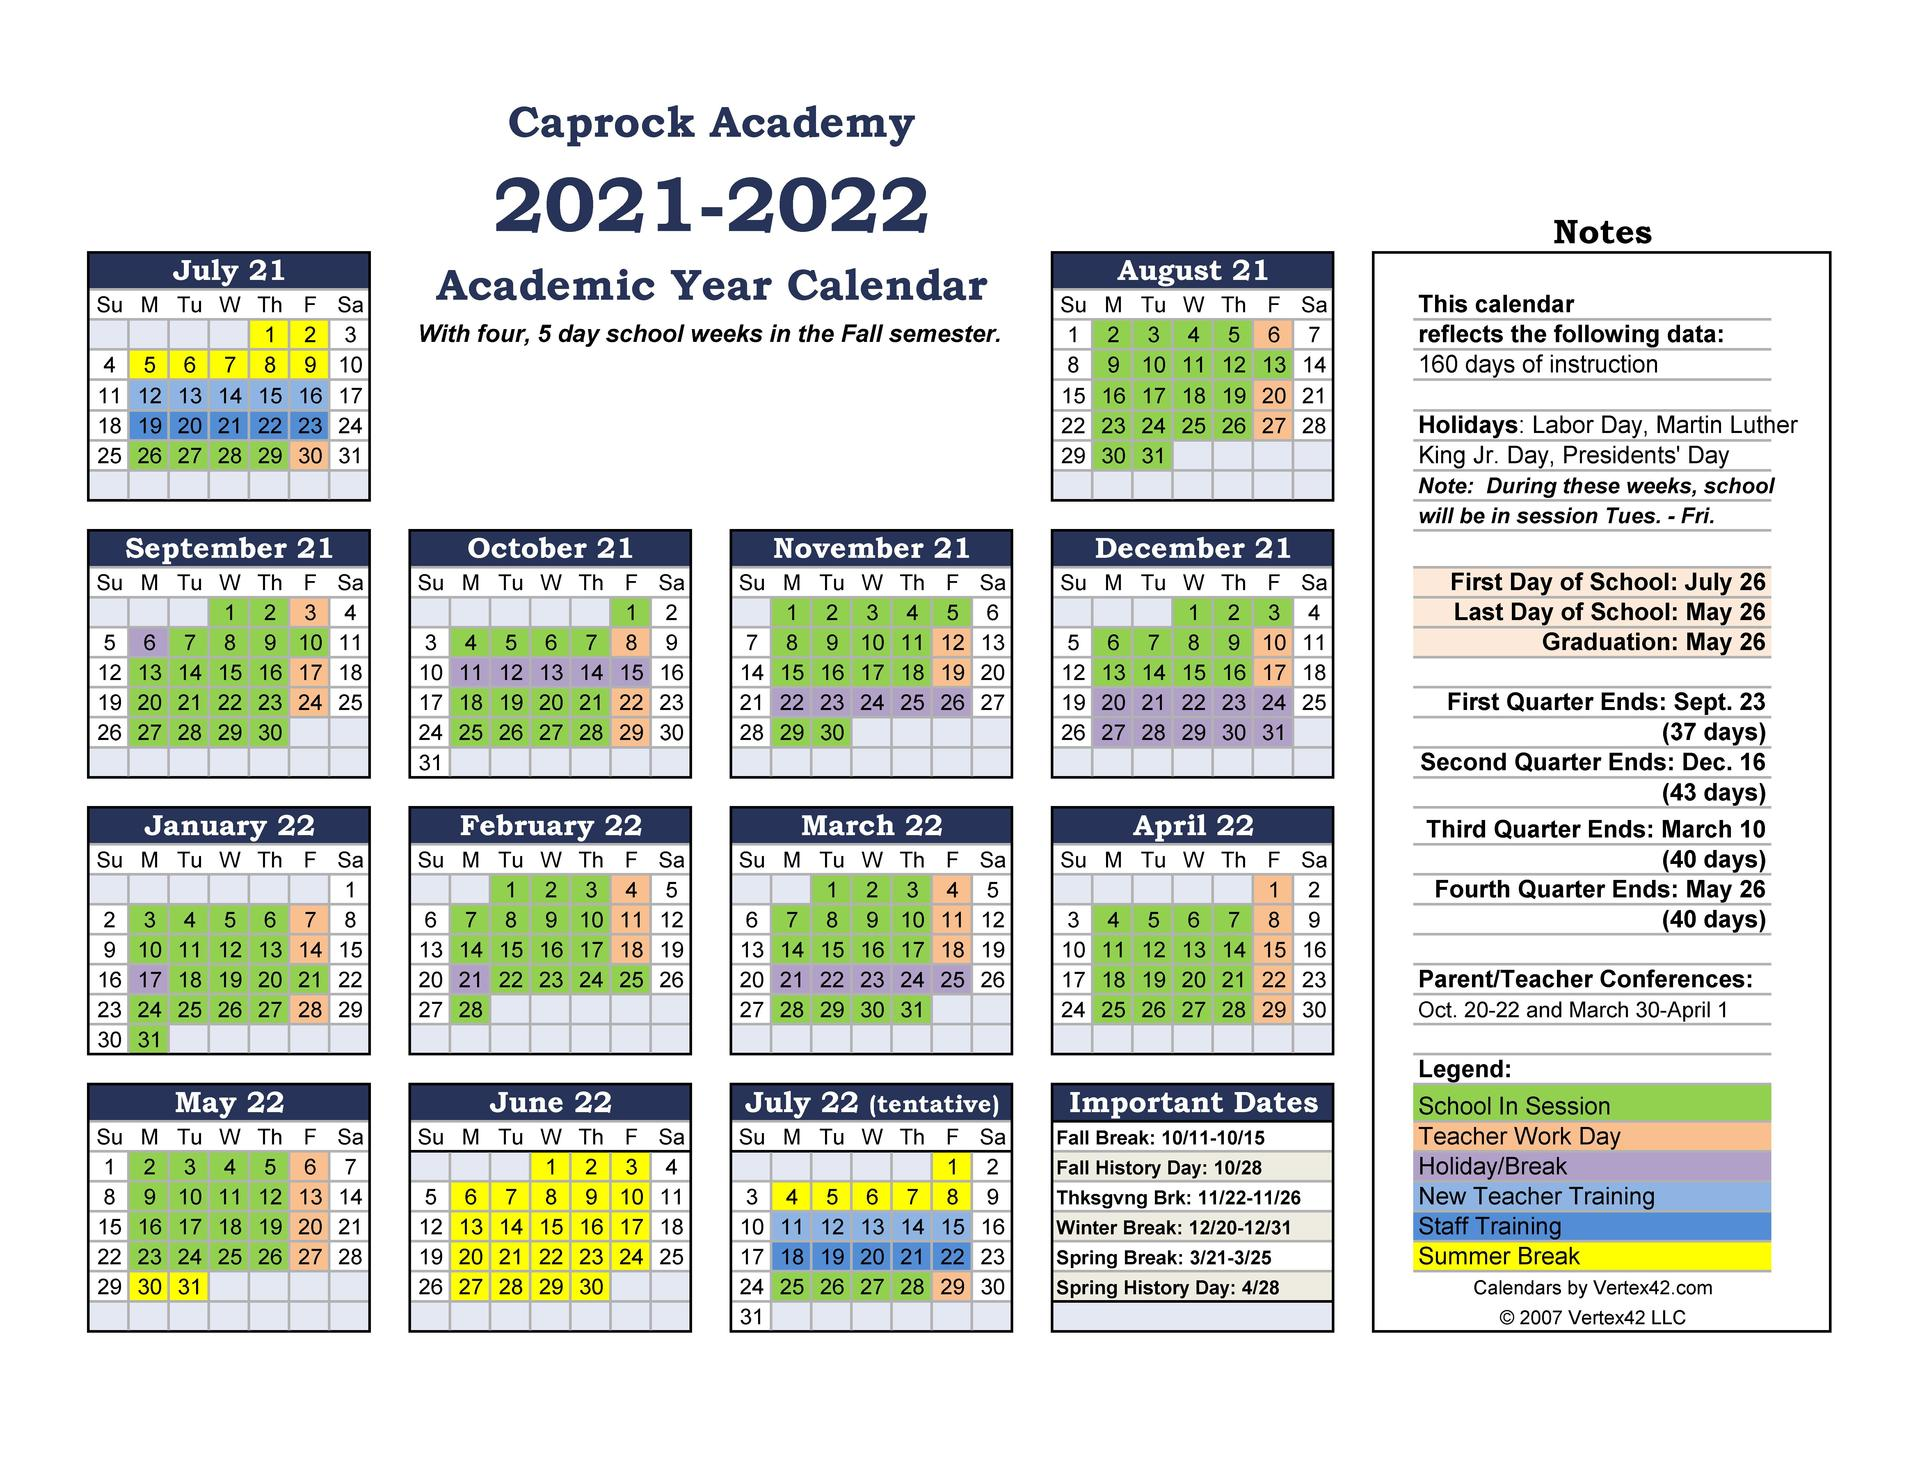 2021-2022 approved school calendar